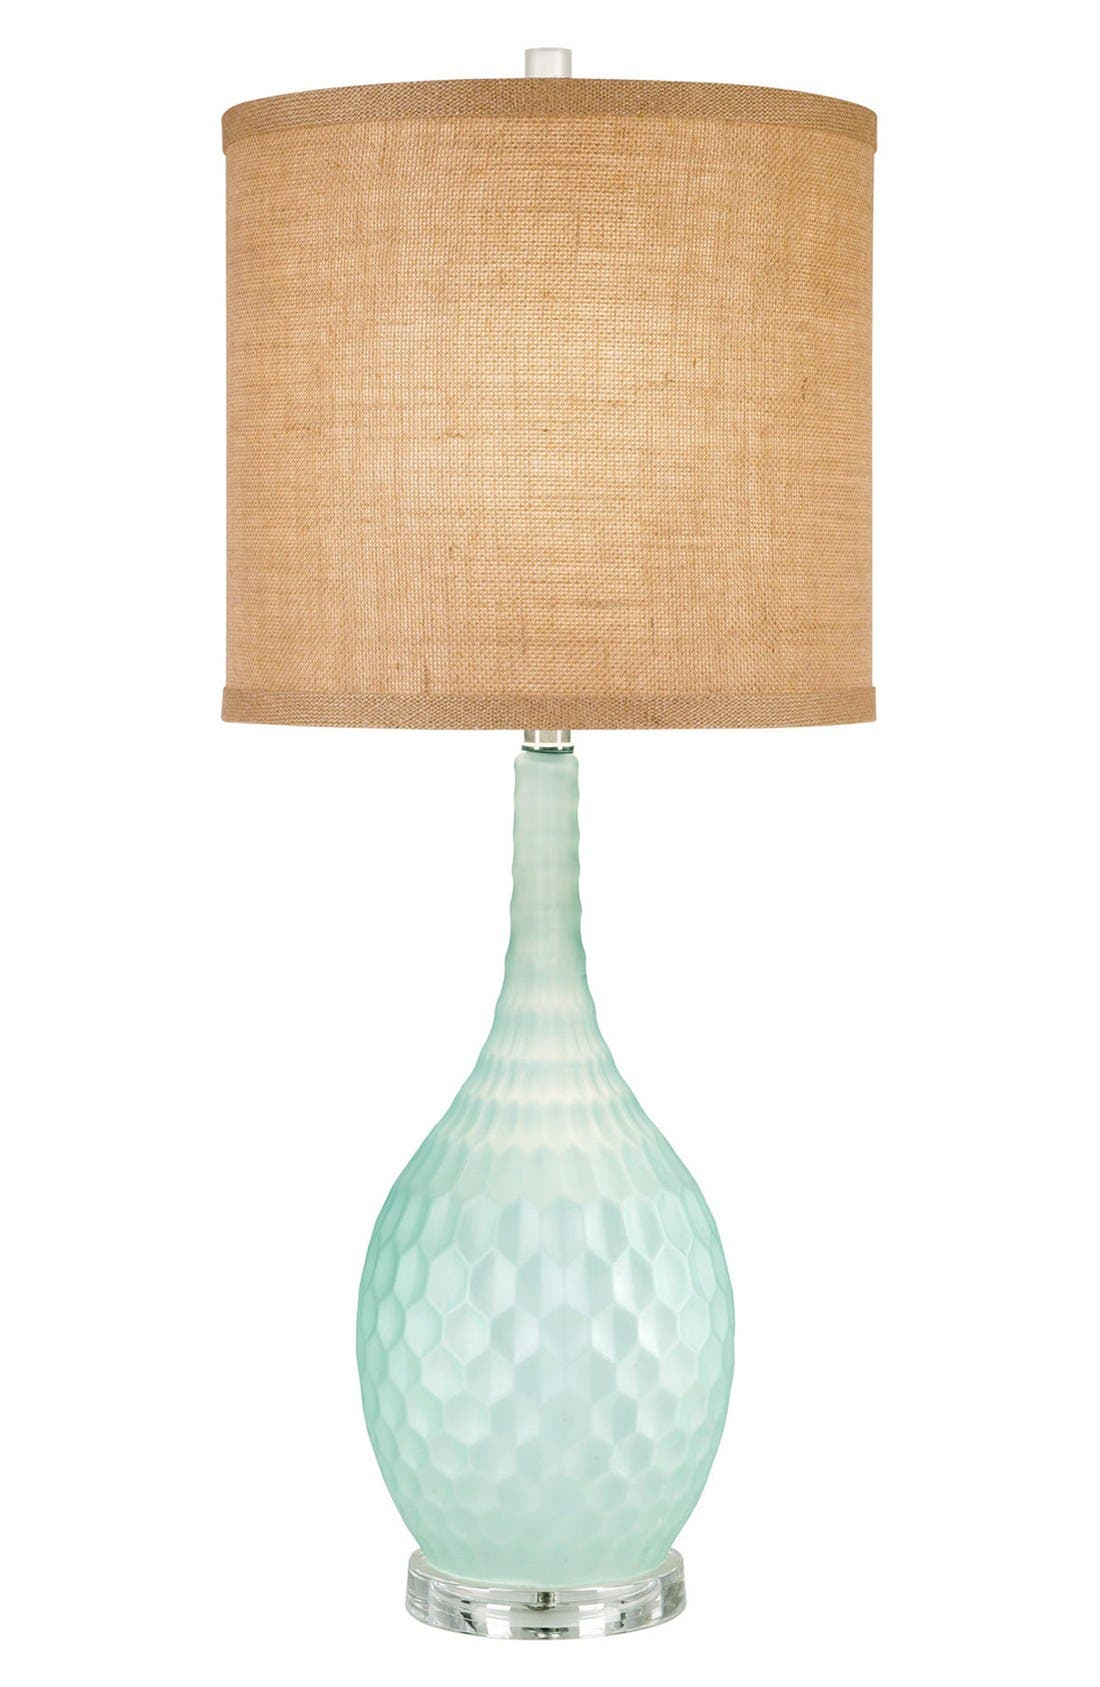 Main Image - JAlexander 'Seafoam' Glass Table Lamp